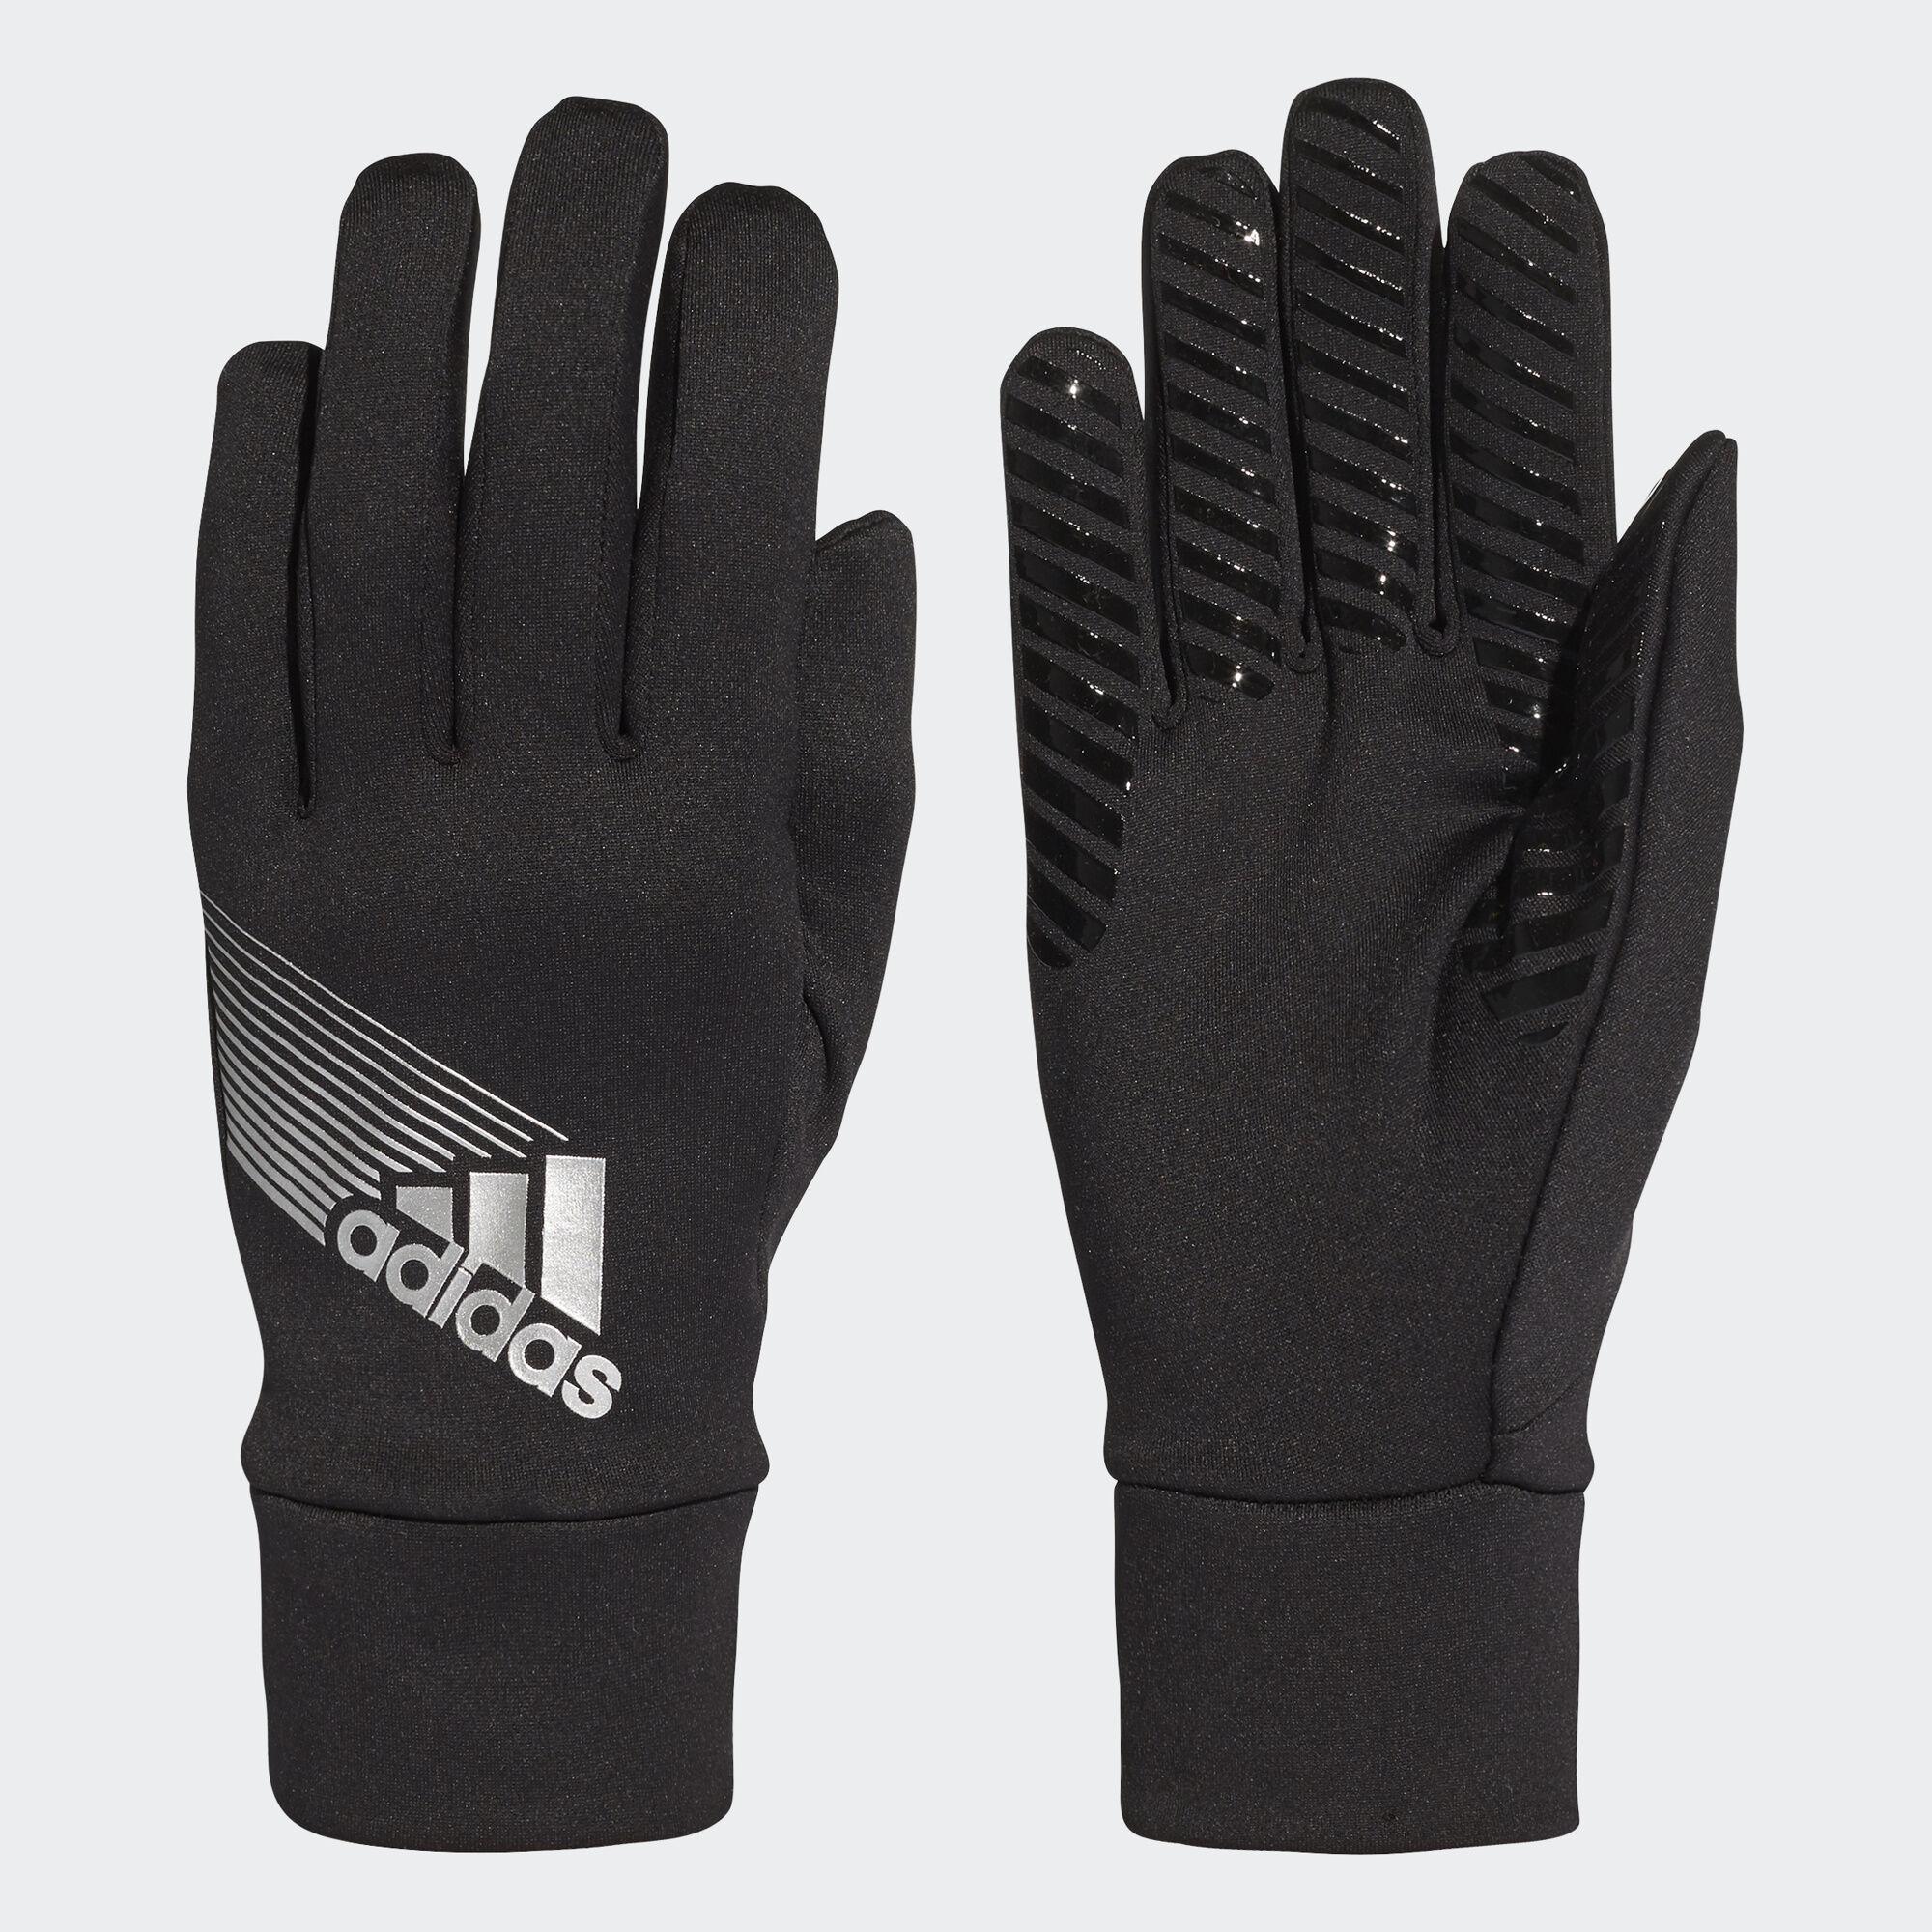 Black light gloves - Adidas Field Player Climaproof Gloves Black Light Grey W44097